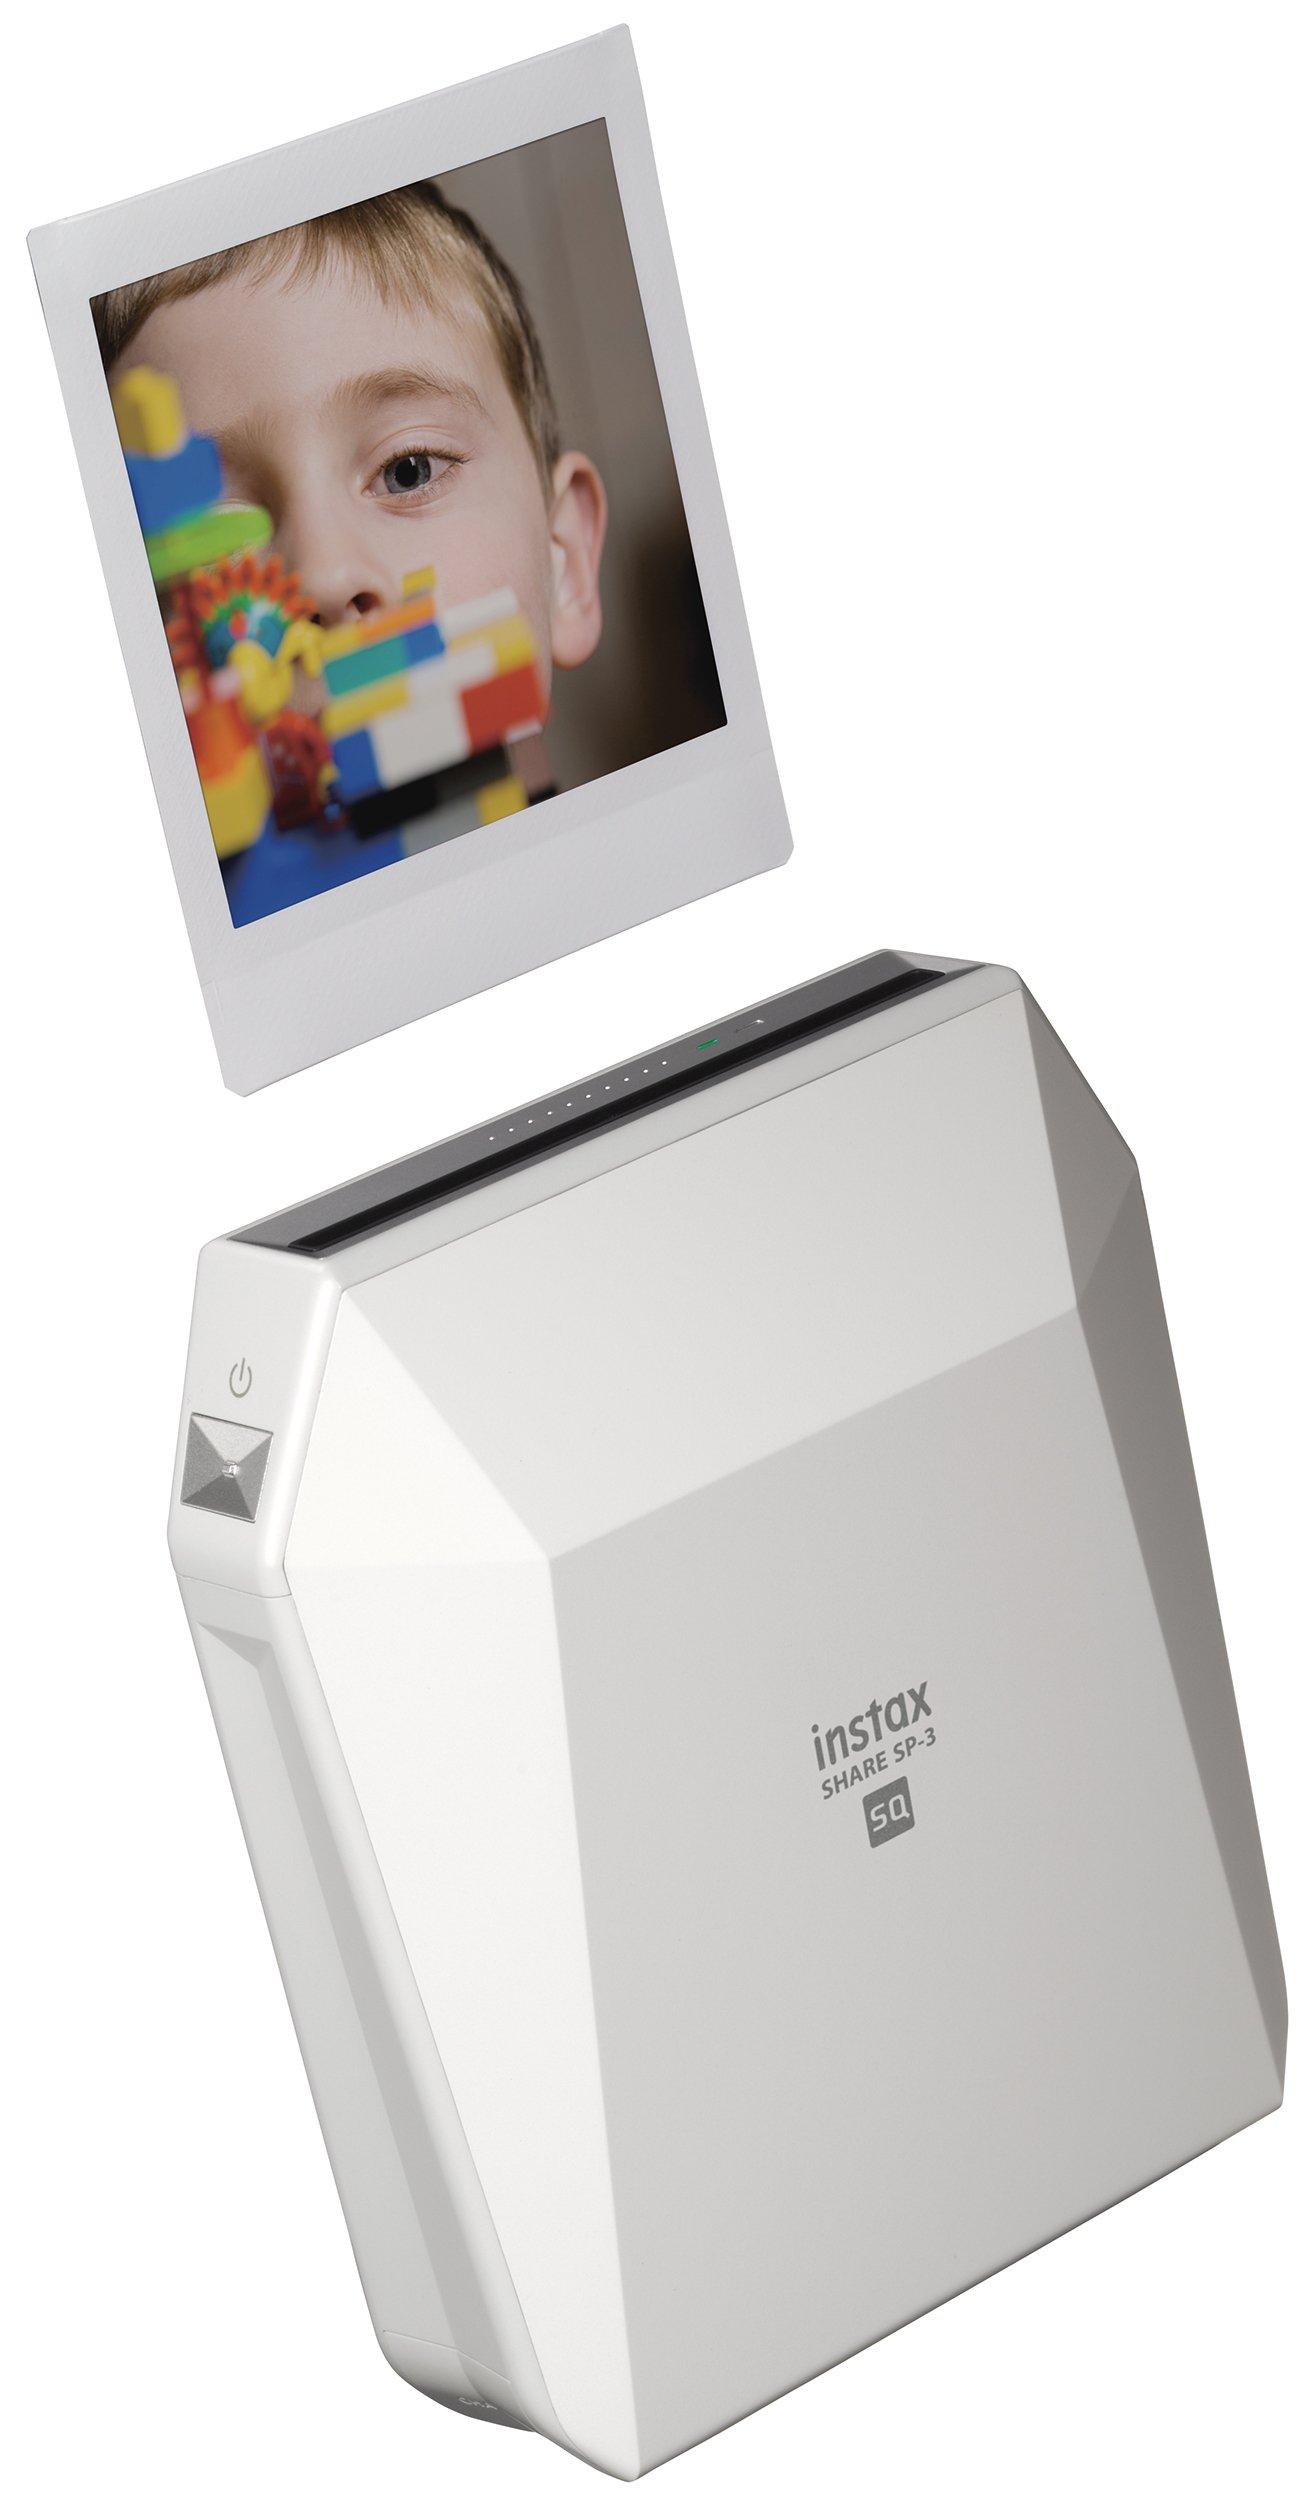 Fujifilm Instax SP-3 Mobile Printer - White by Fujifilm